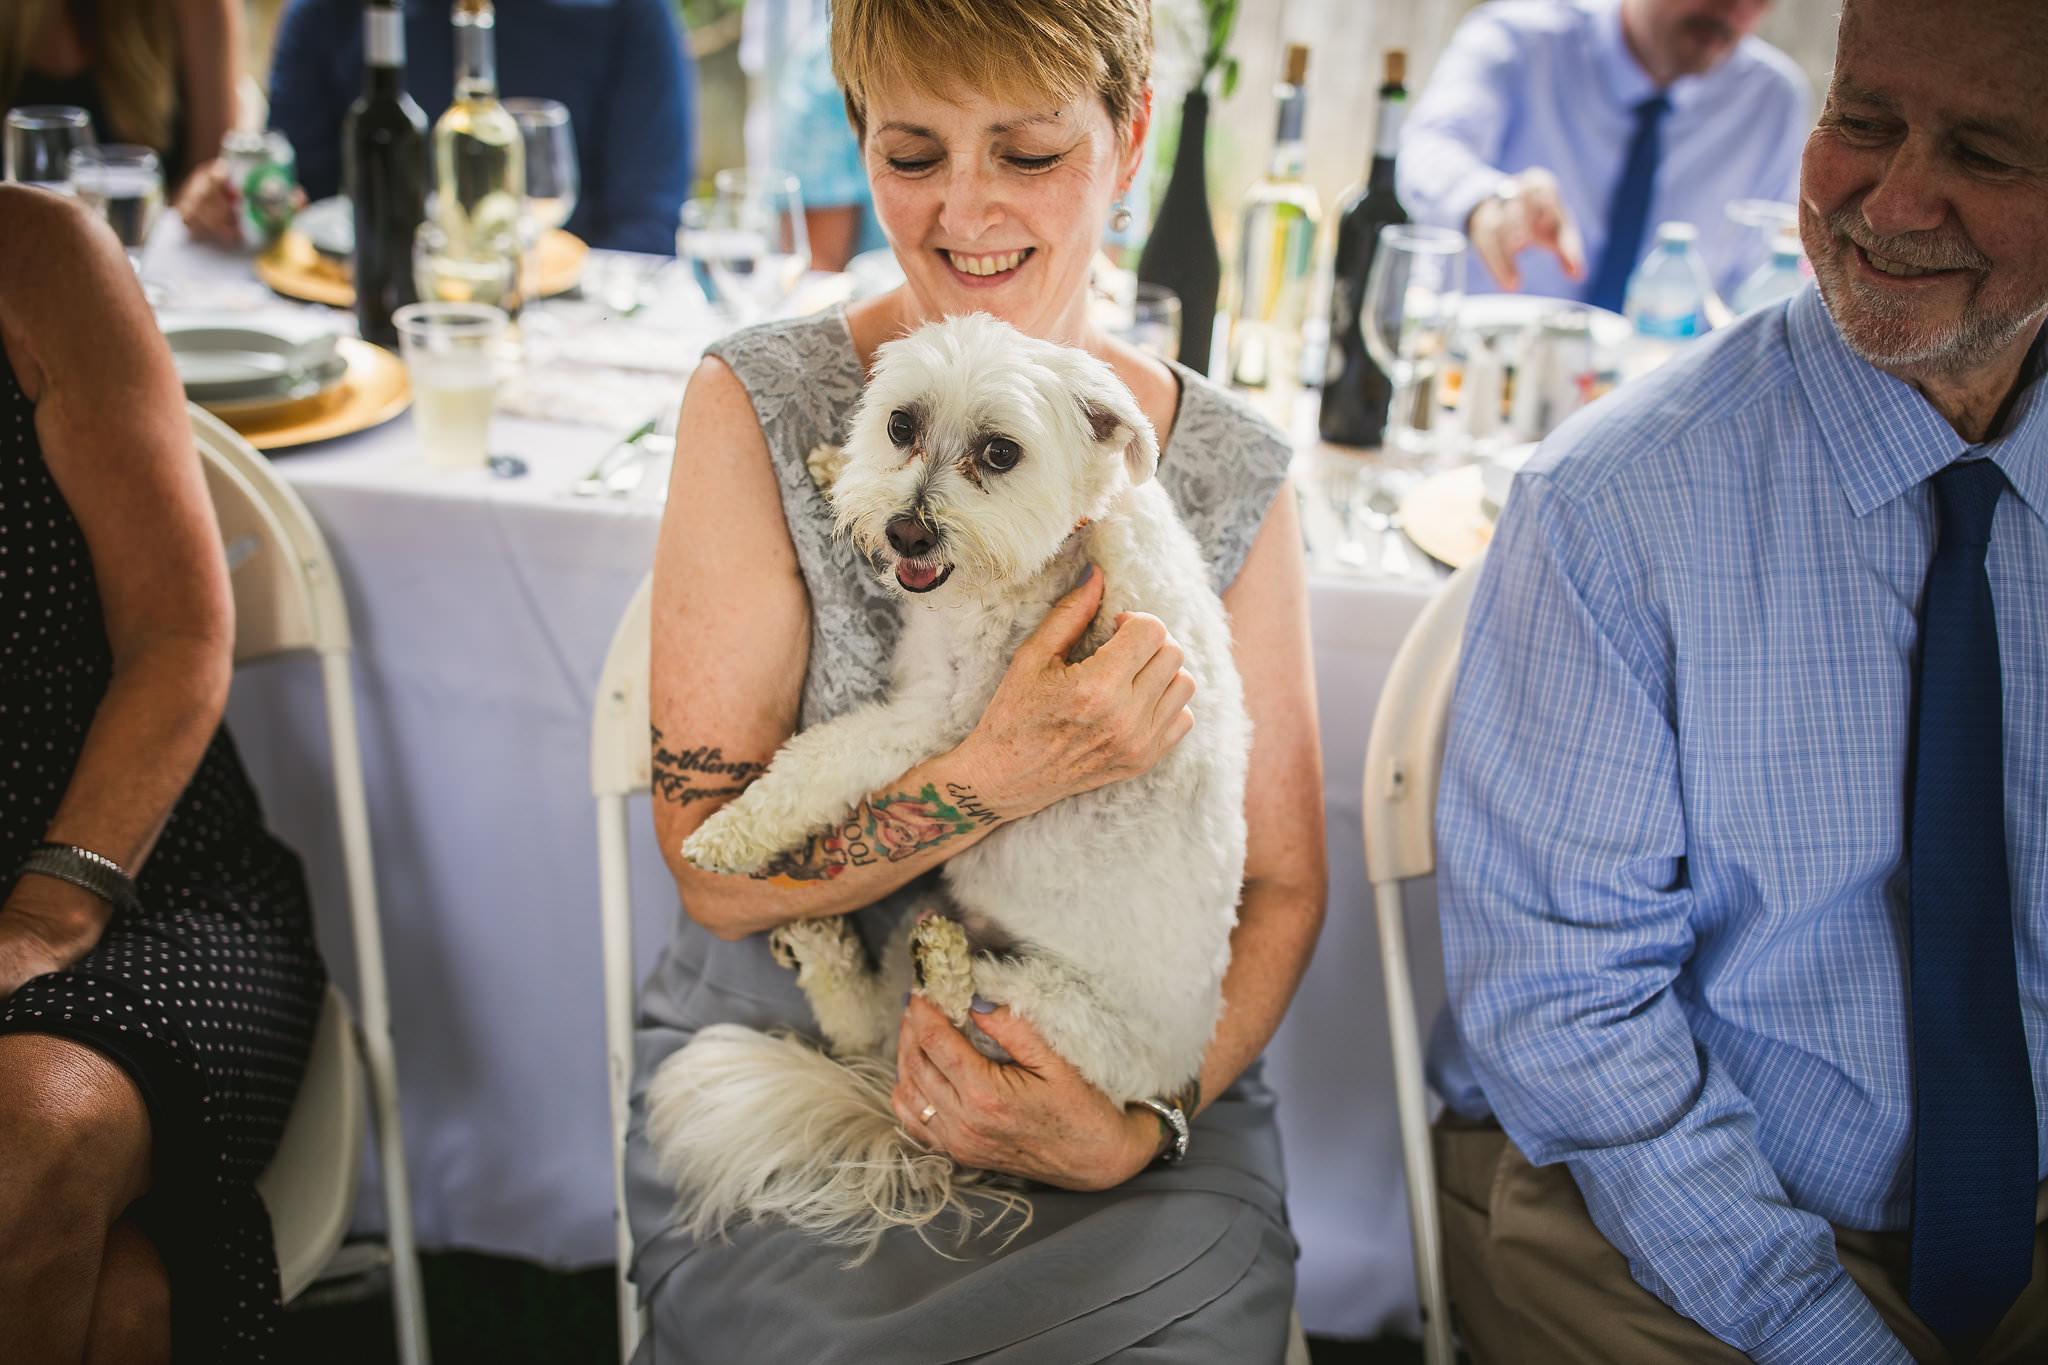 Kristen Adam Kindred Loft Whitby Wedding Photos 136 - Durham Wedding Photographer: Kindred Loft Wedding Photos